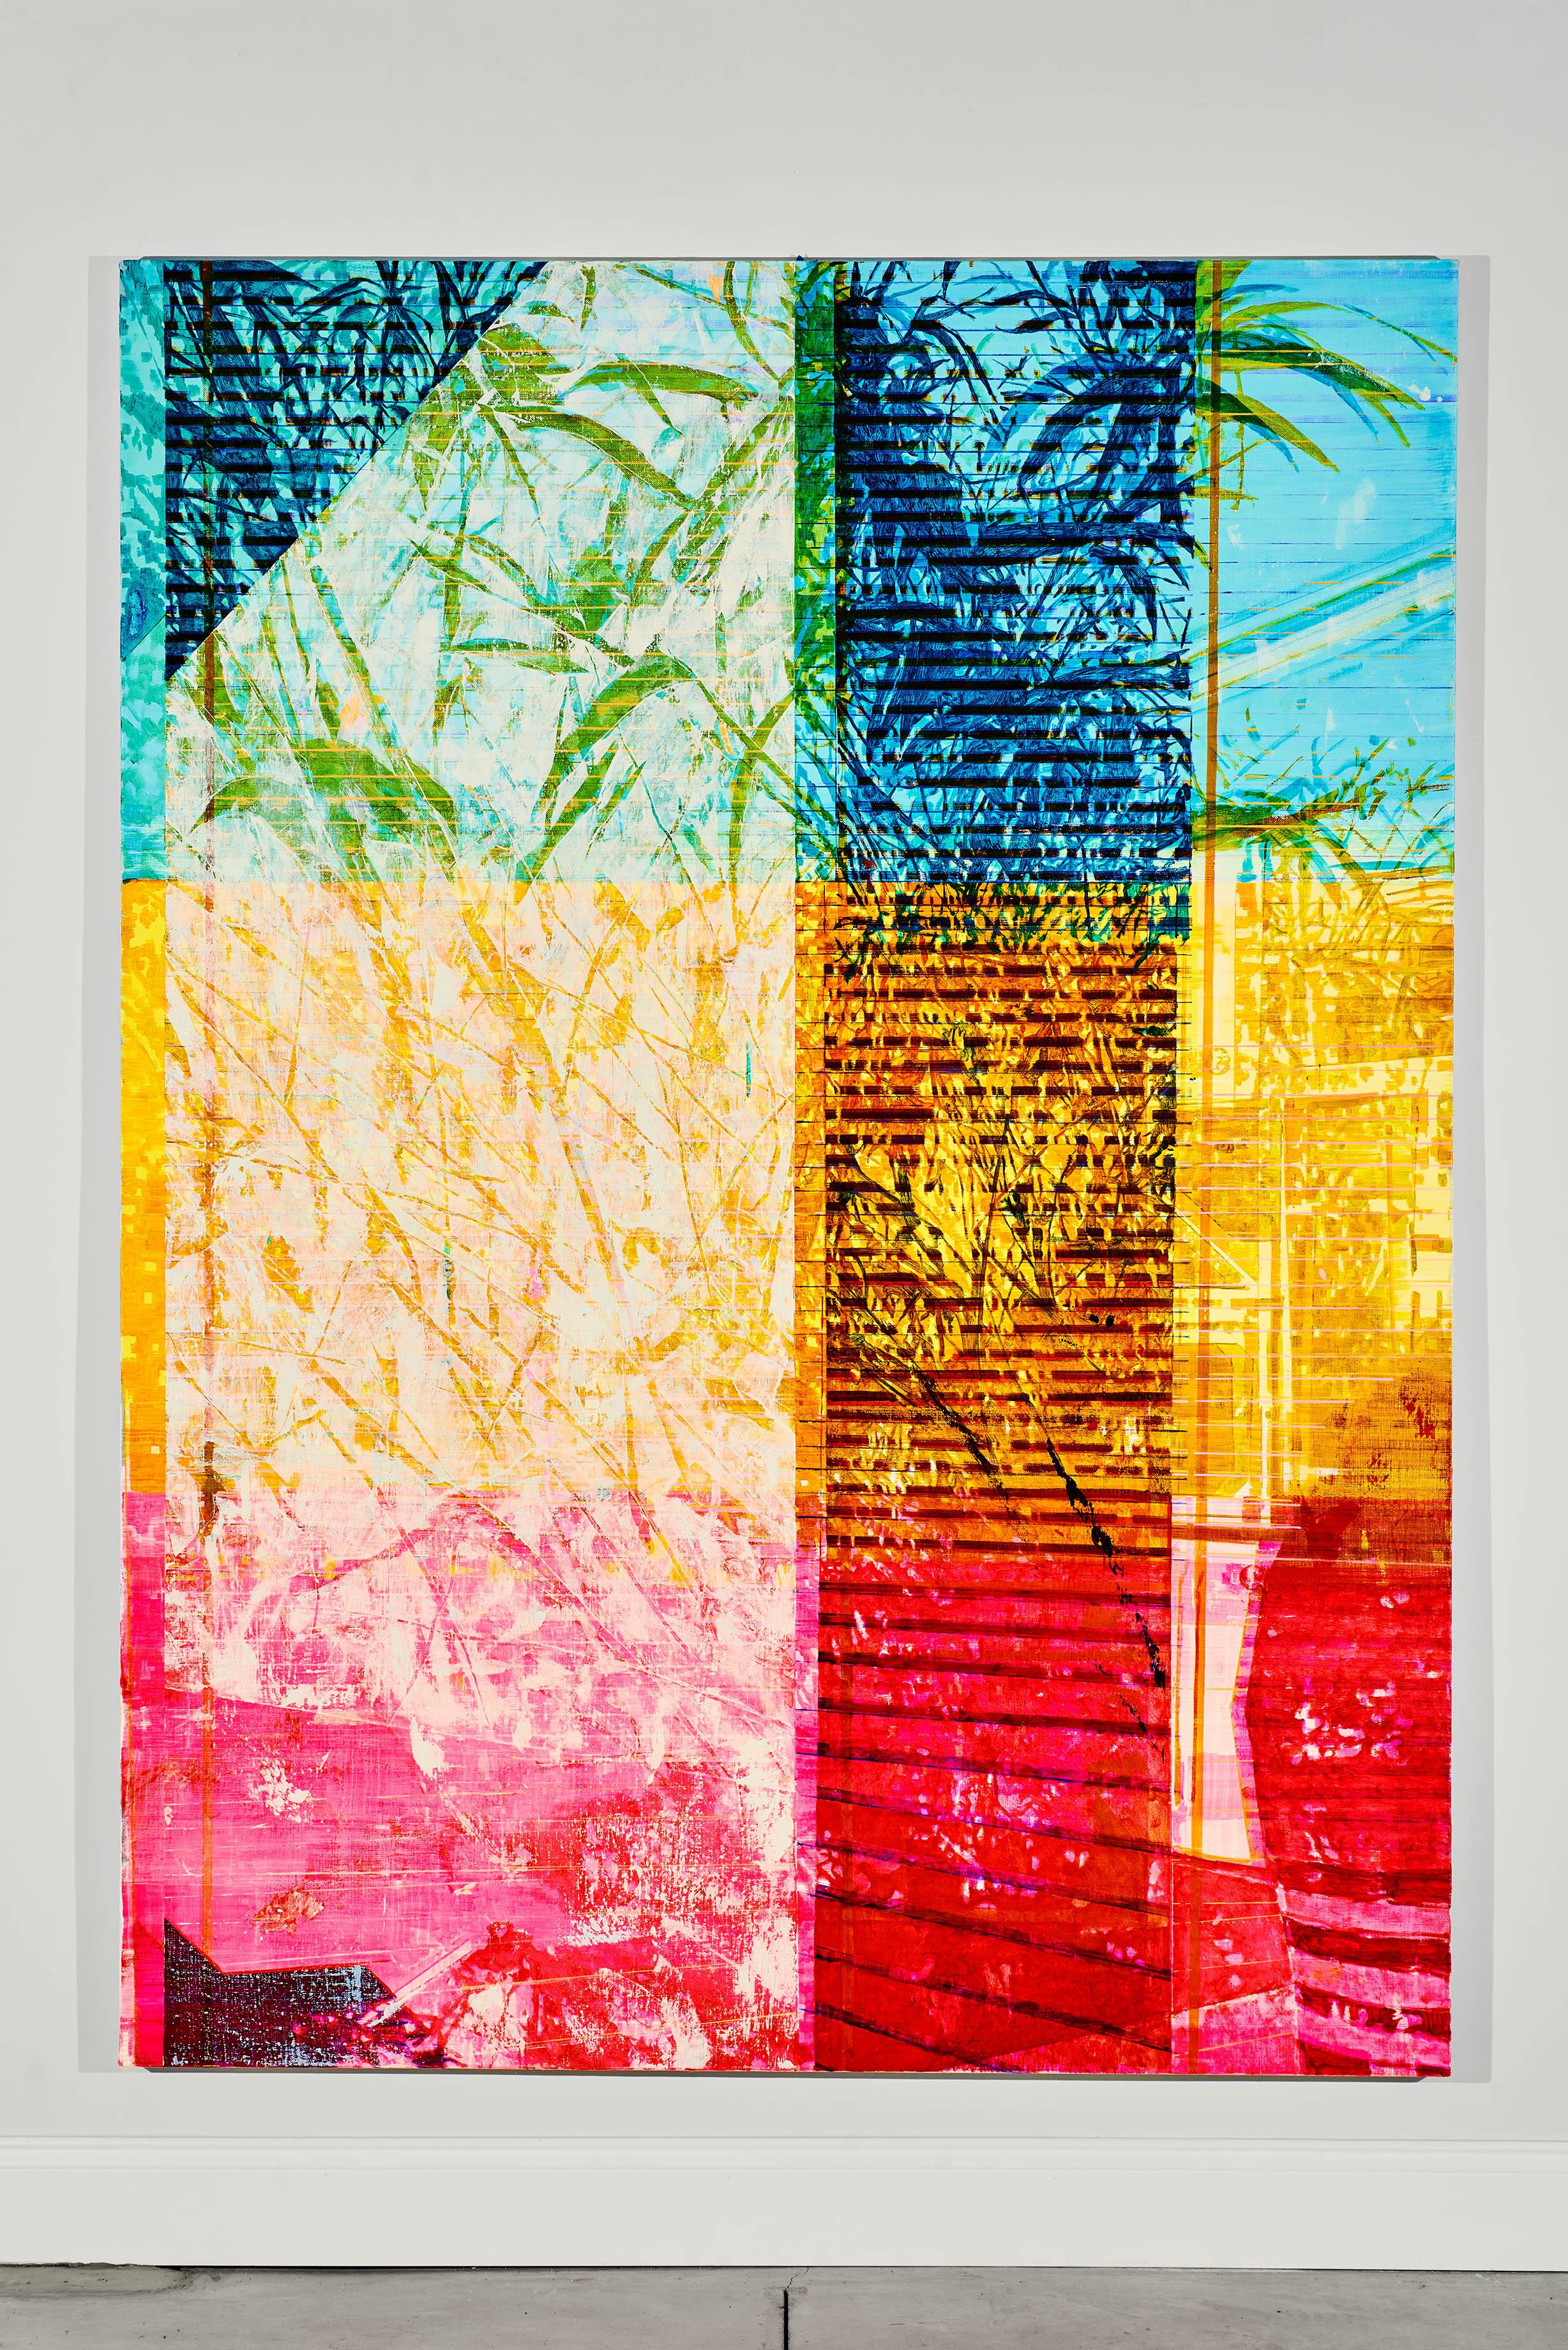 Interview: Jered Sprecher - The Focus - LOCATE Arts